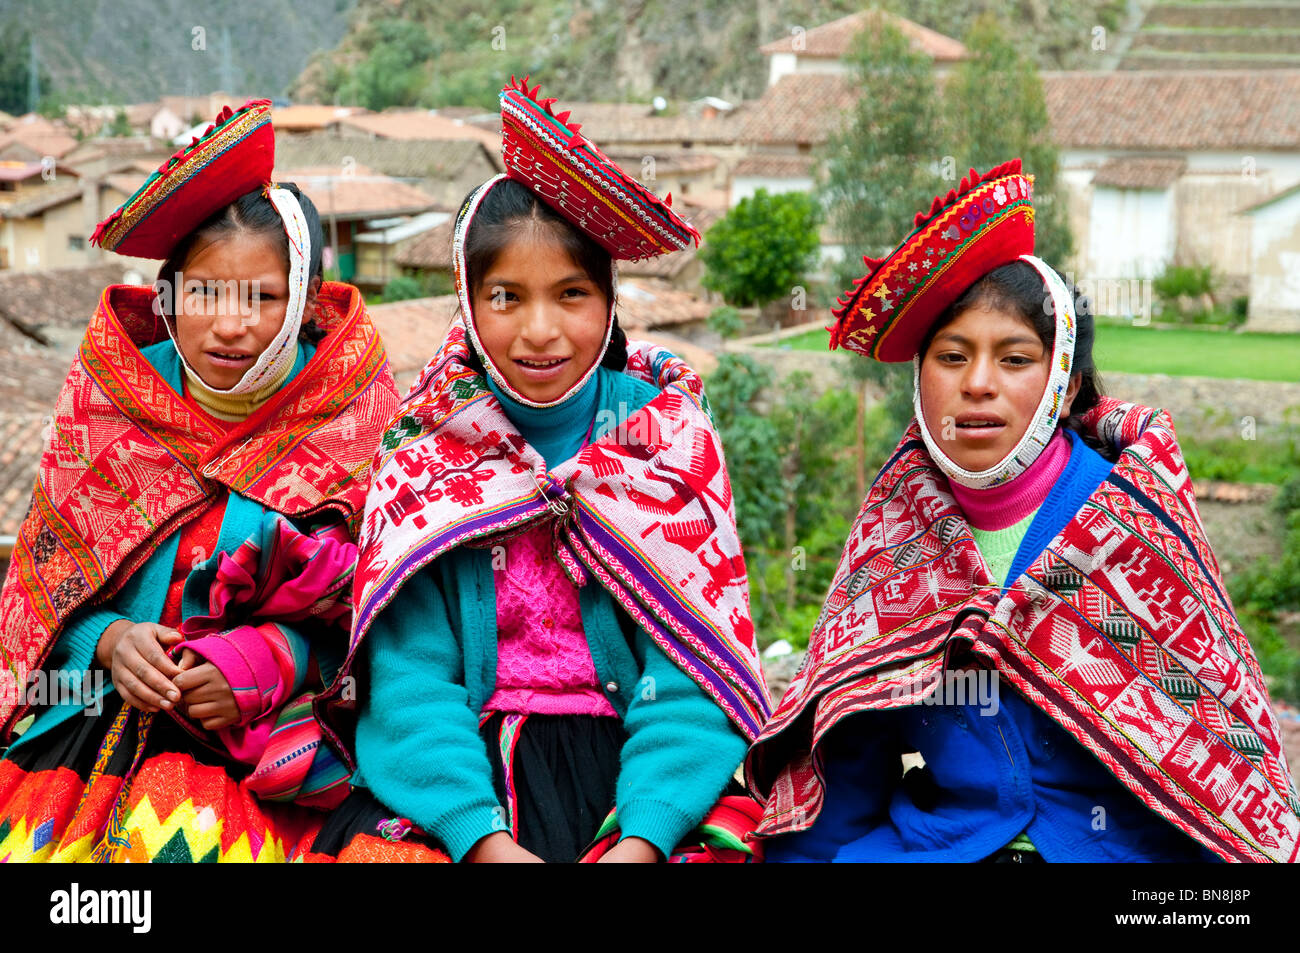 Peruvian Girls In Traditional Dress In Ollantaytambo